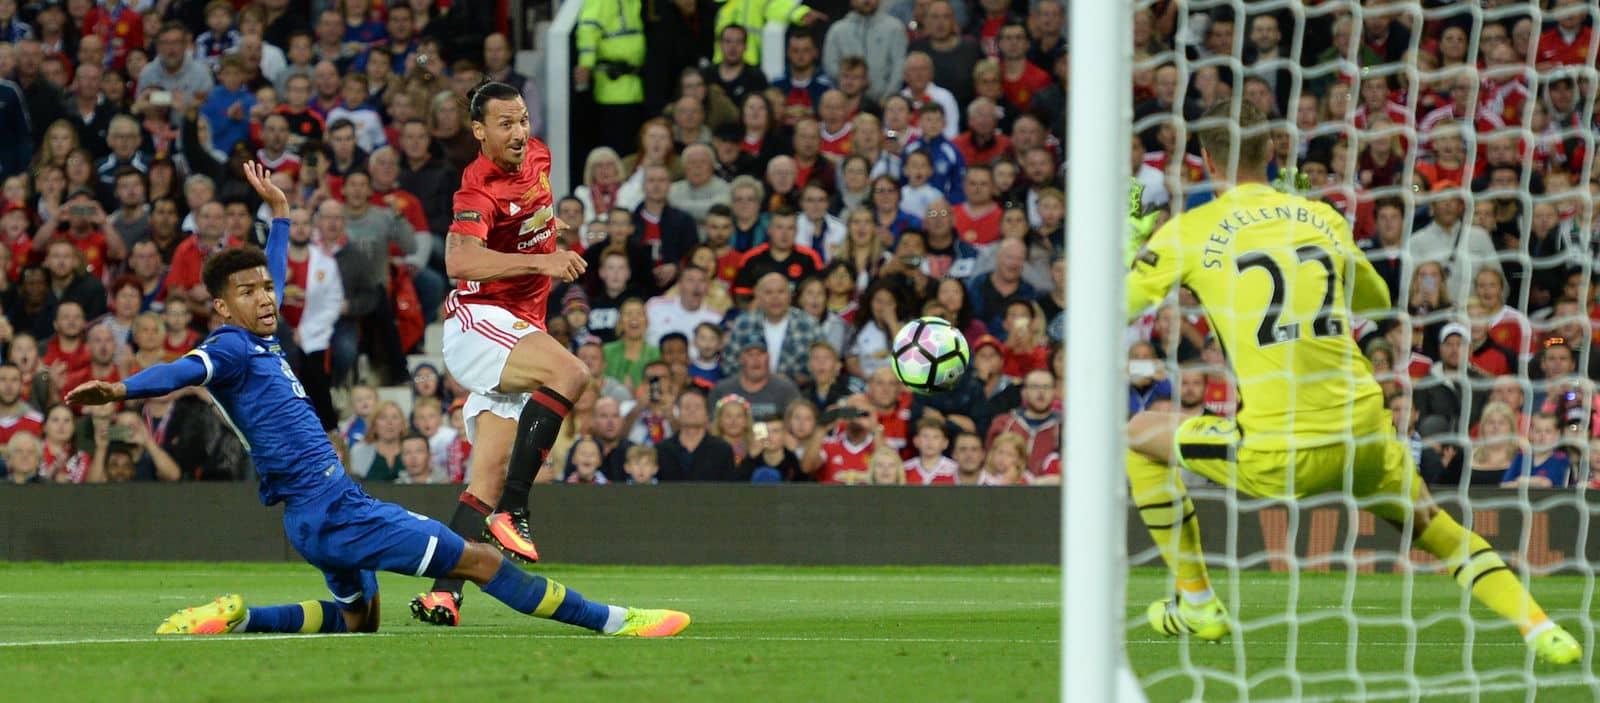 Zlatan Ibrahimovic: My shirt brought Paul Pogba back to Man United